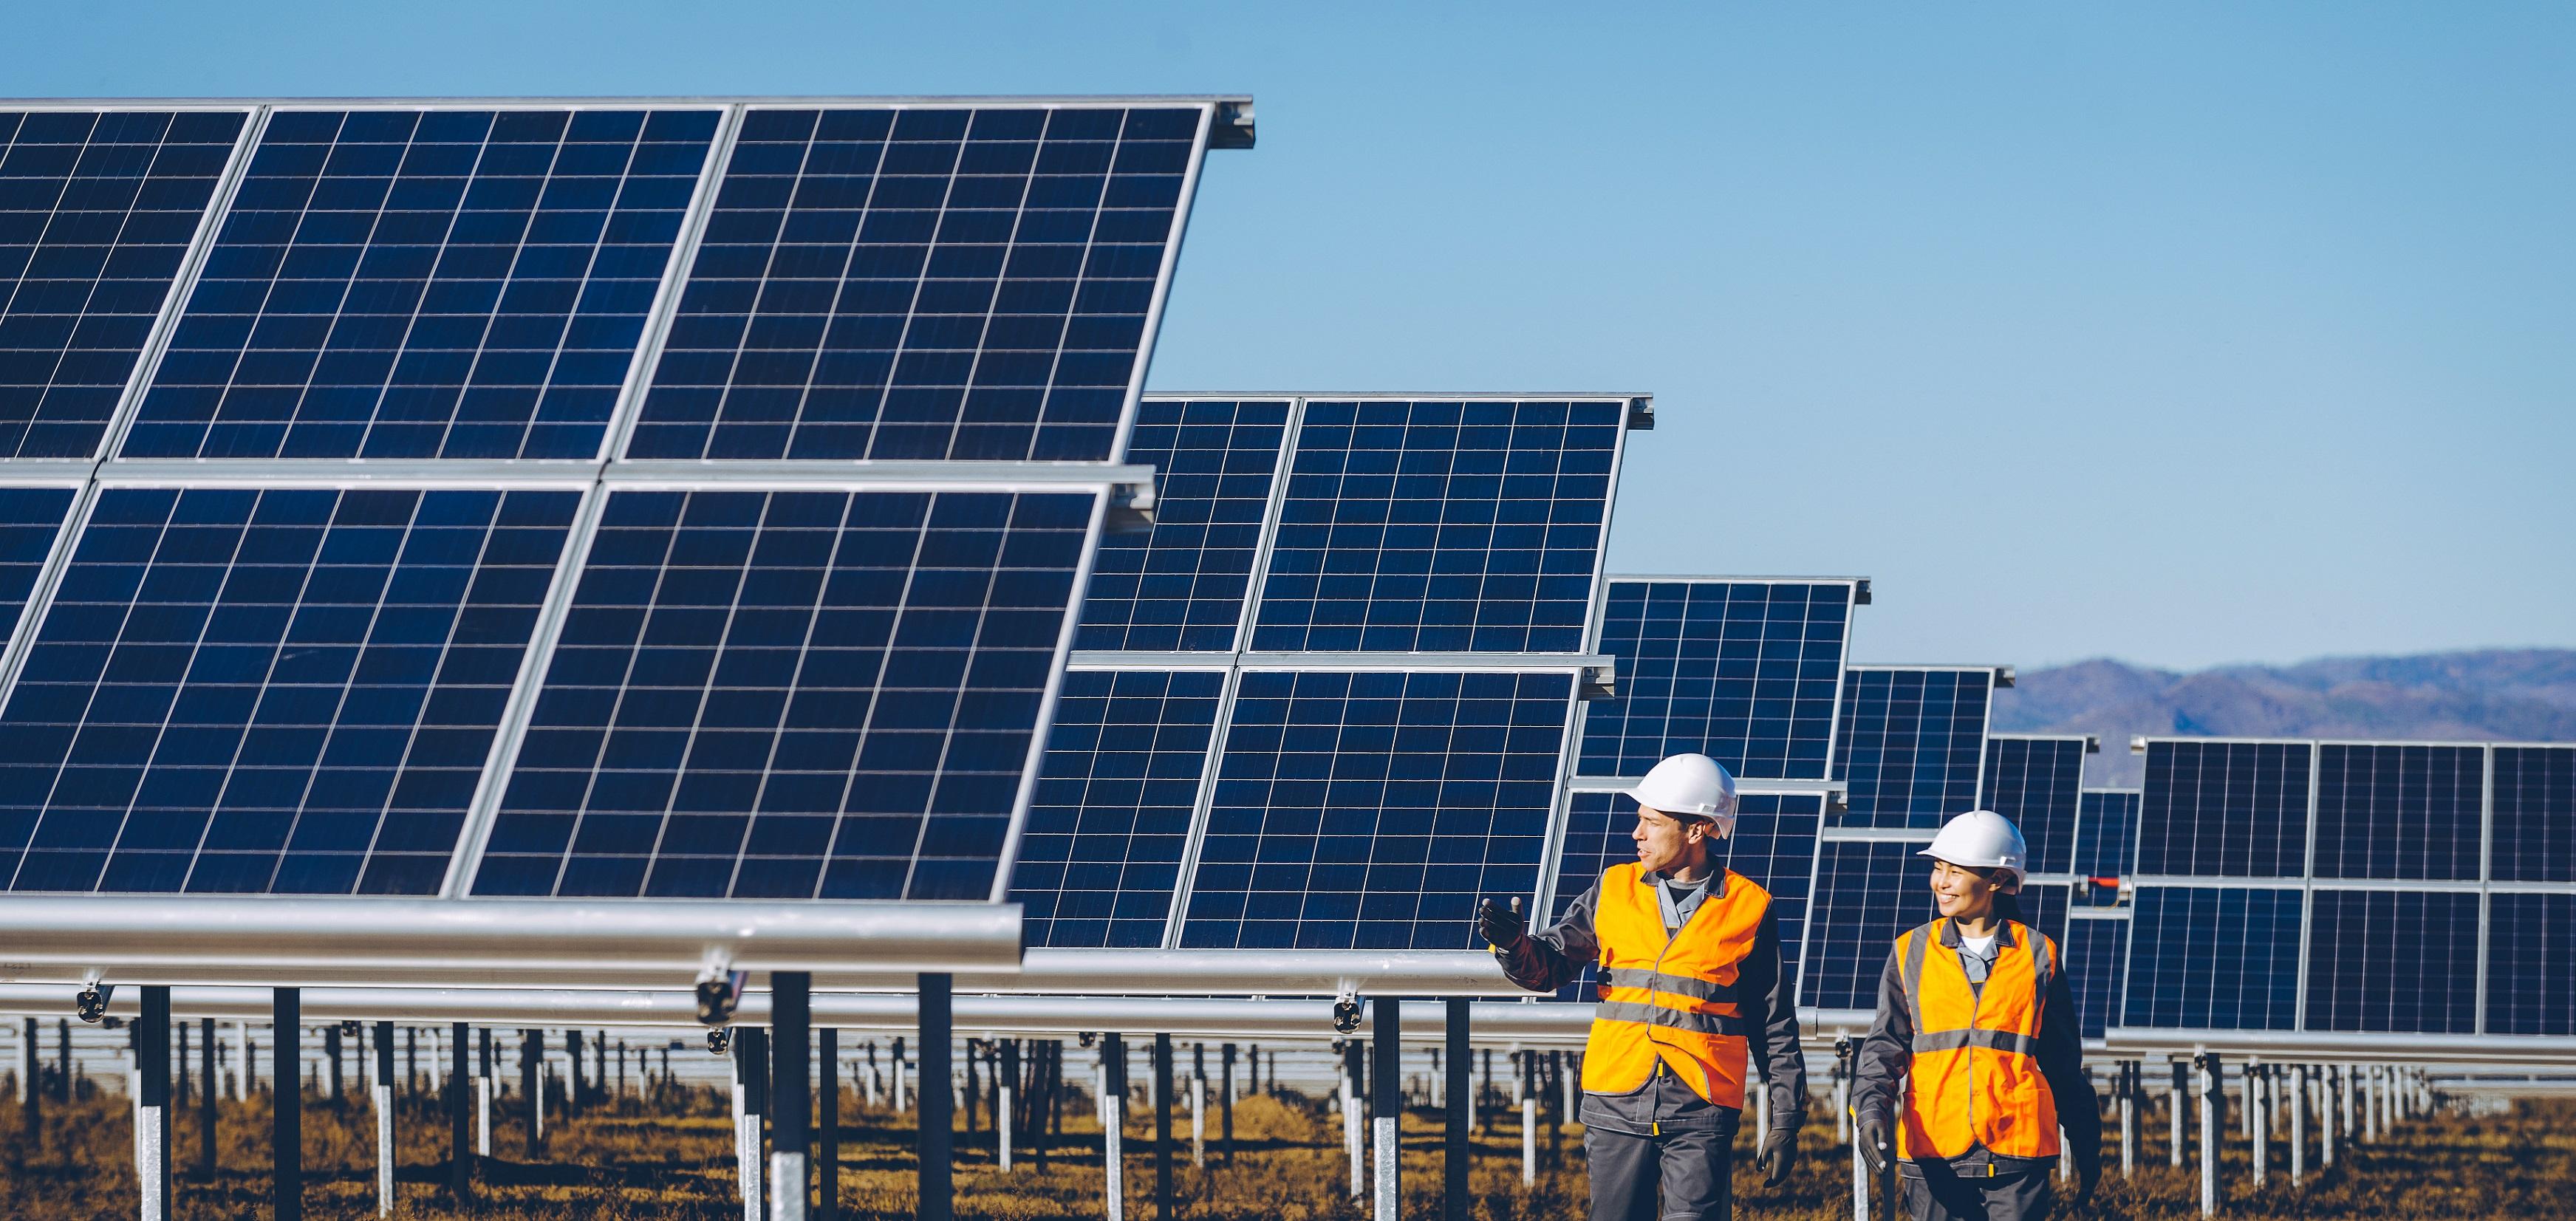 Advancing inclusion through clean energy jobs